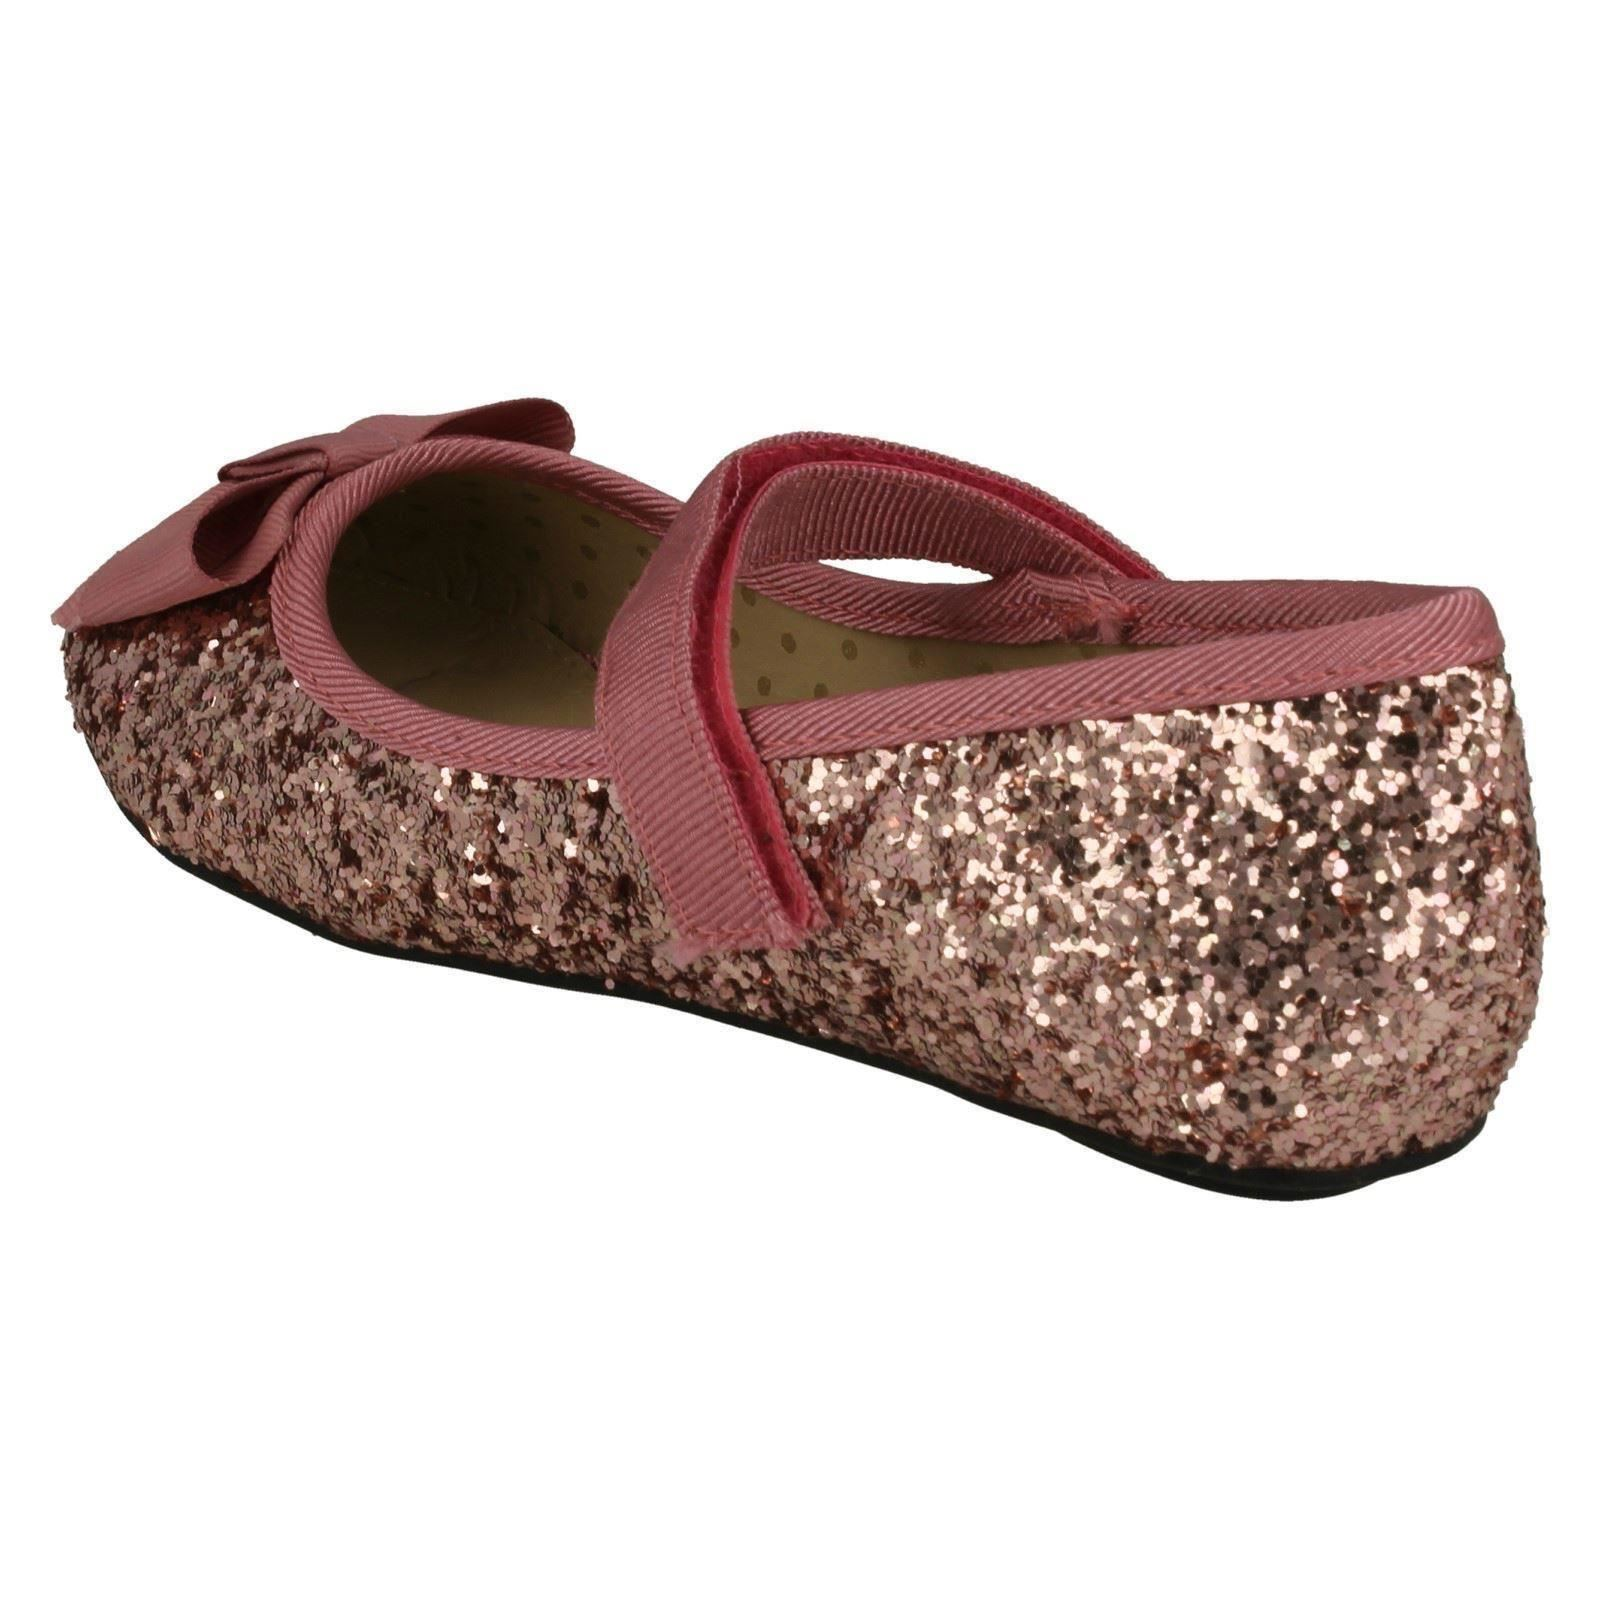 Filles Cutie Glitter Party Flats